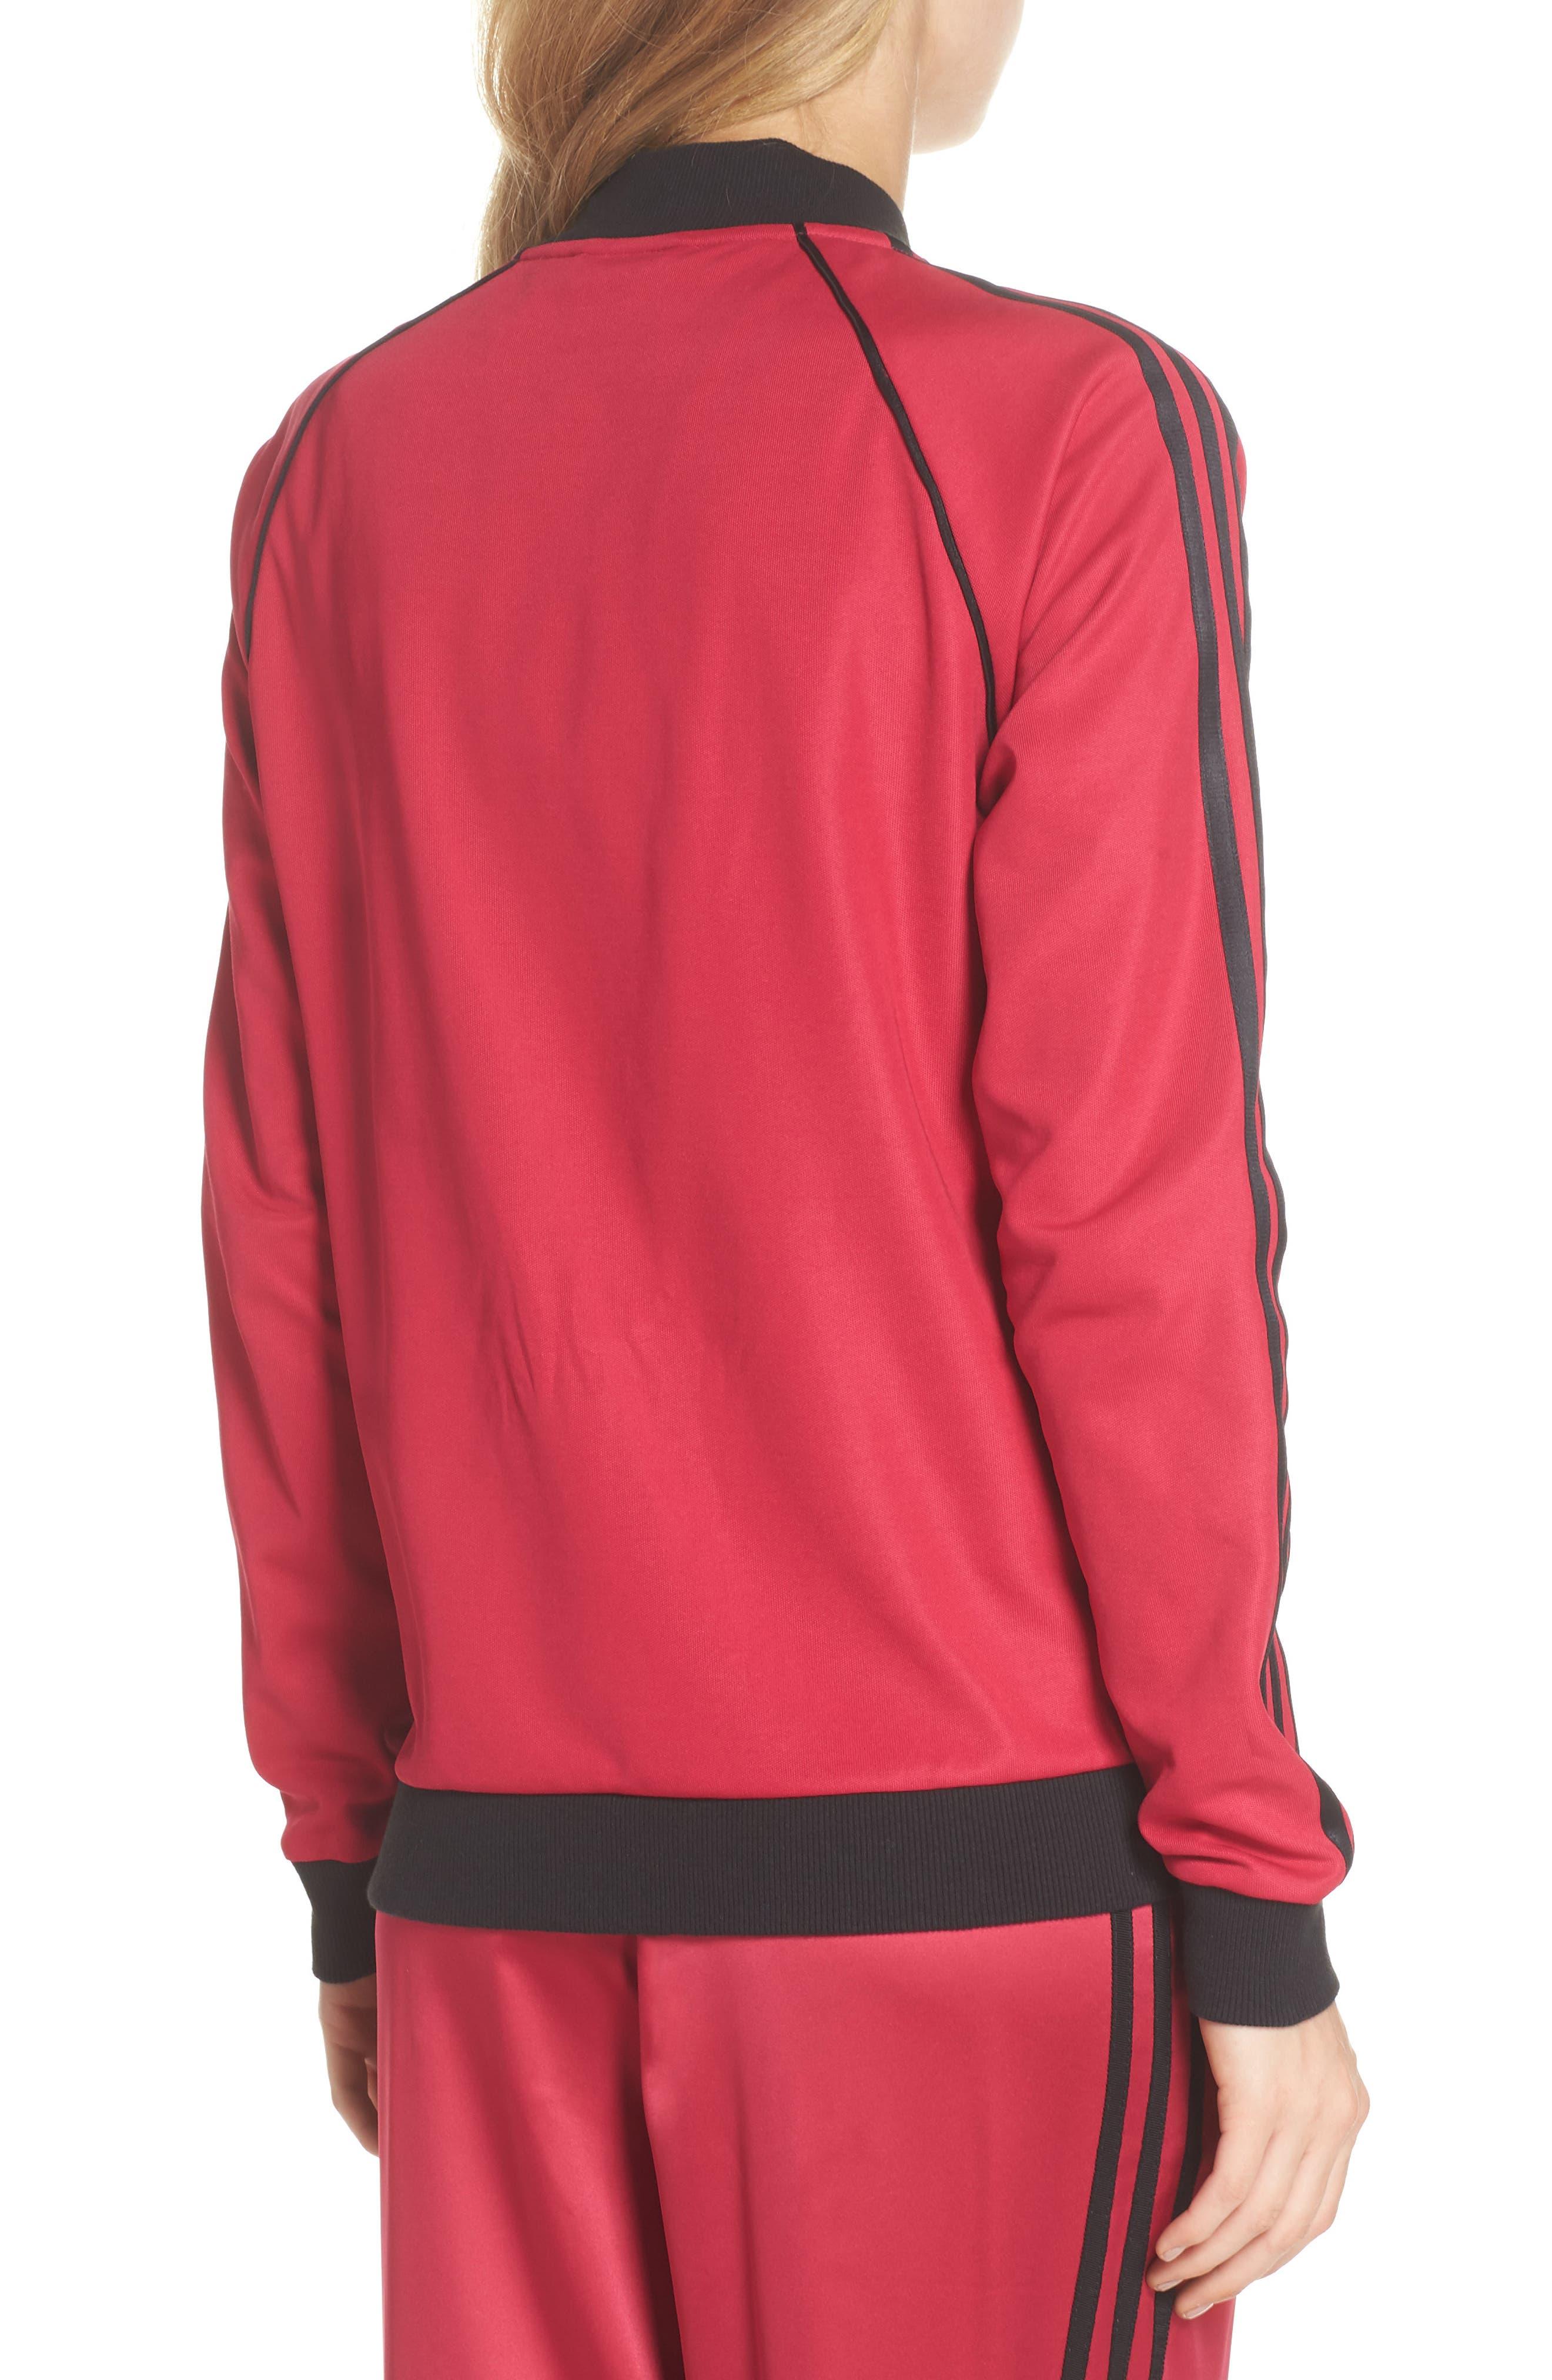 adidas Track Jacket,                             Alternate thumbnail 2, color,                             650